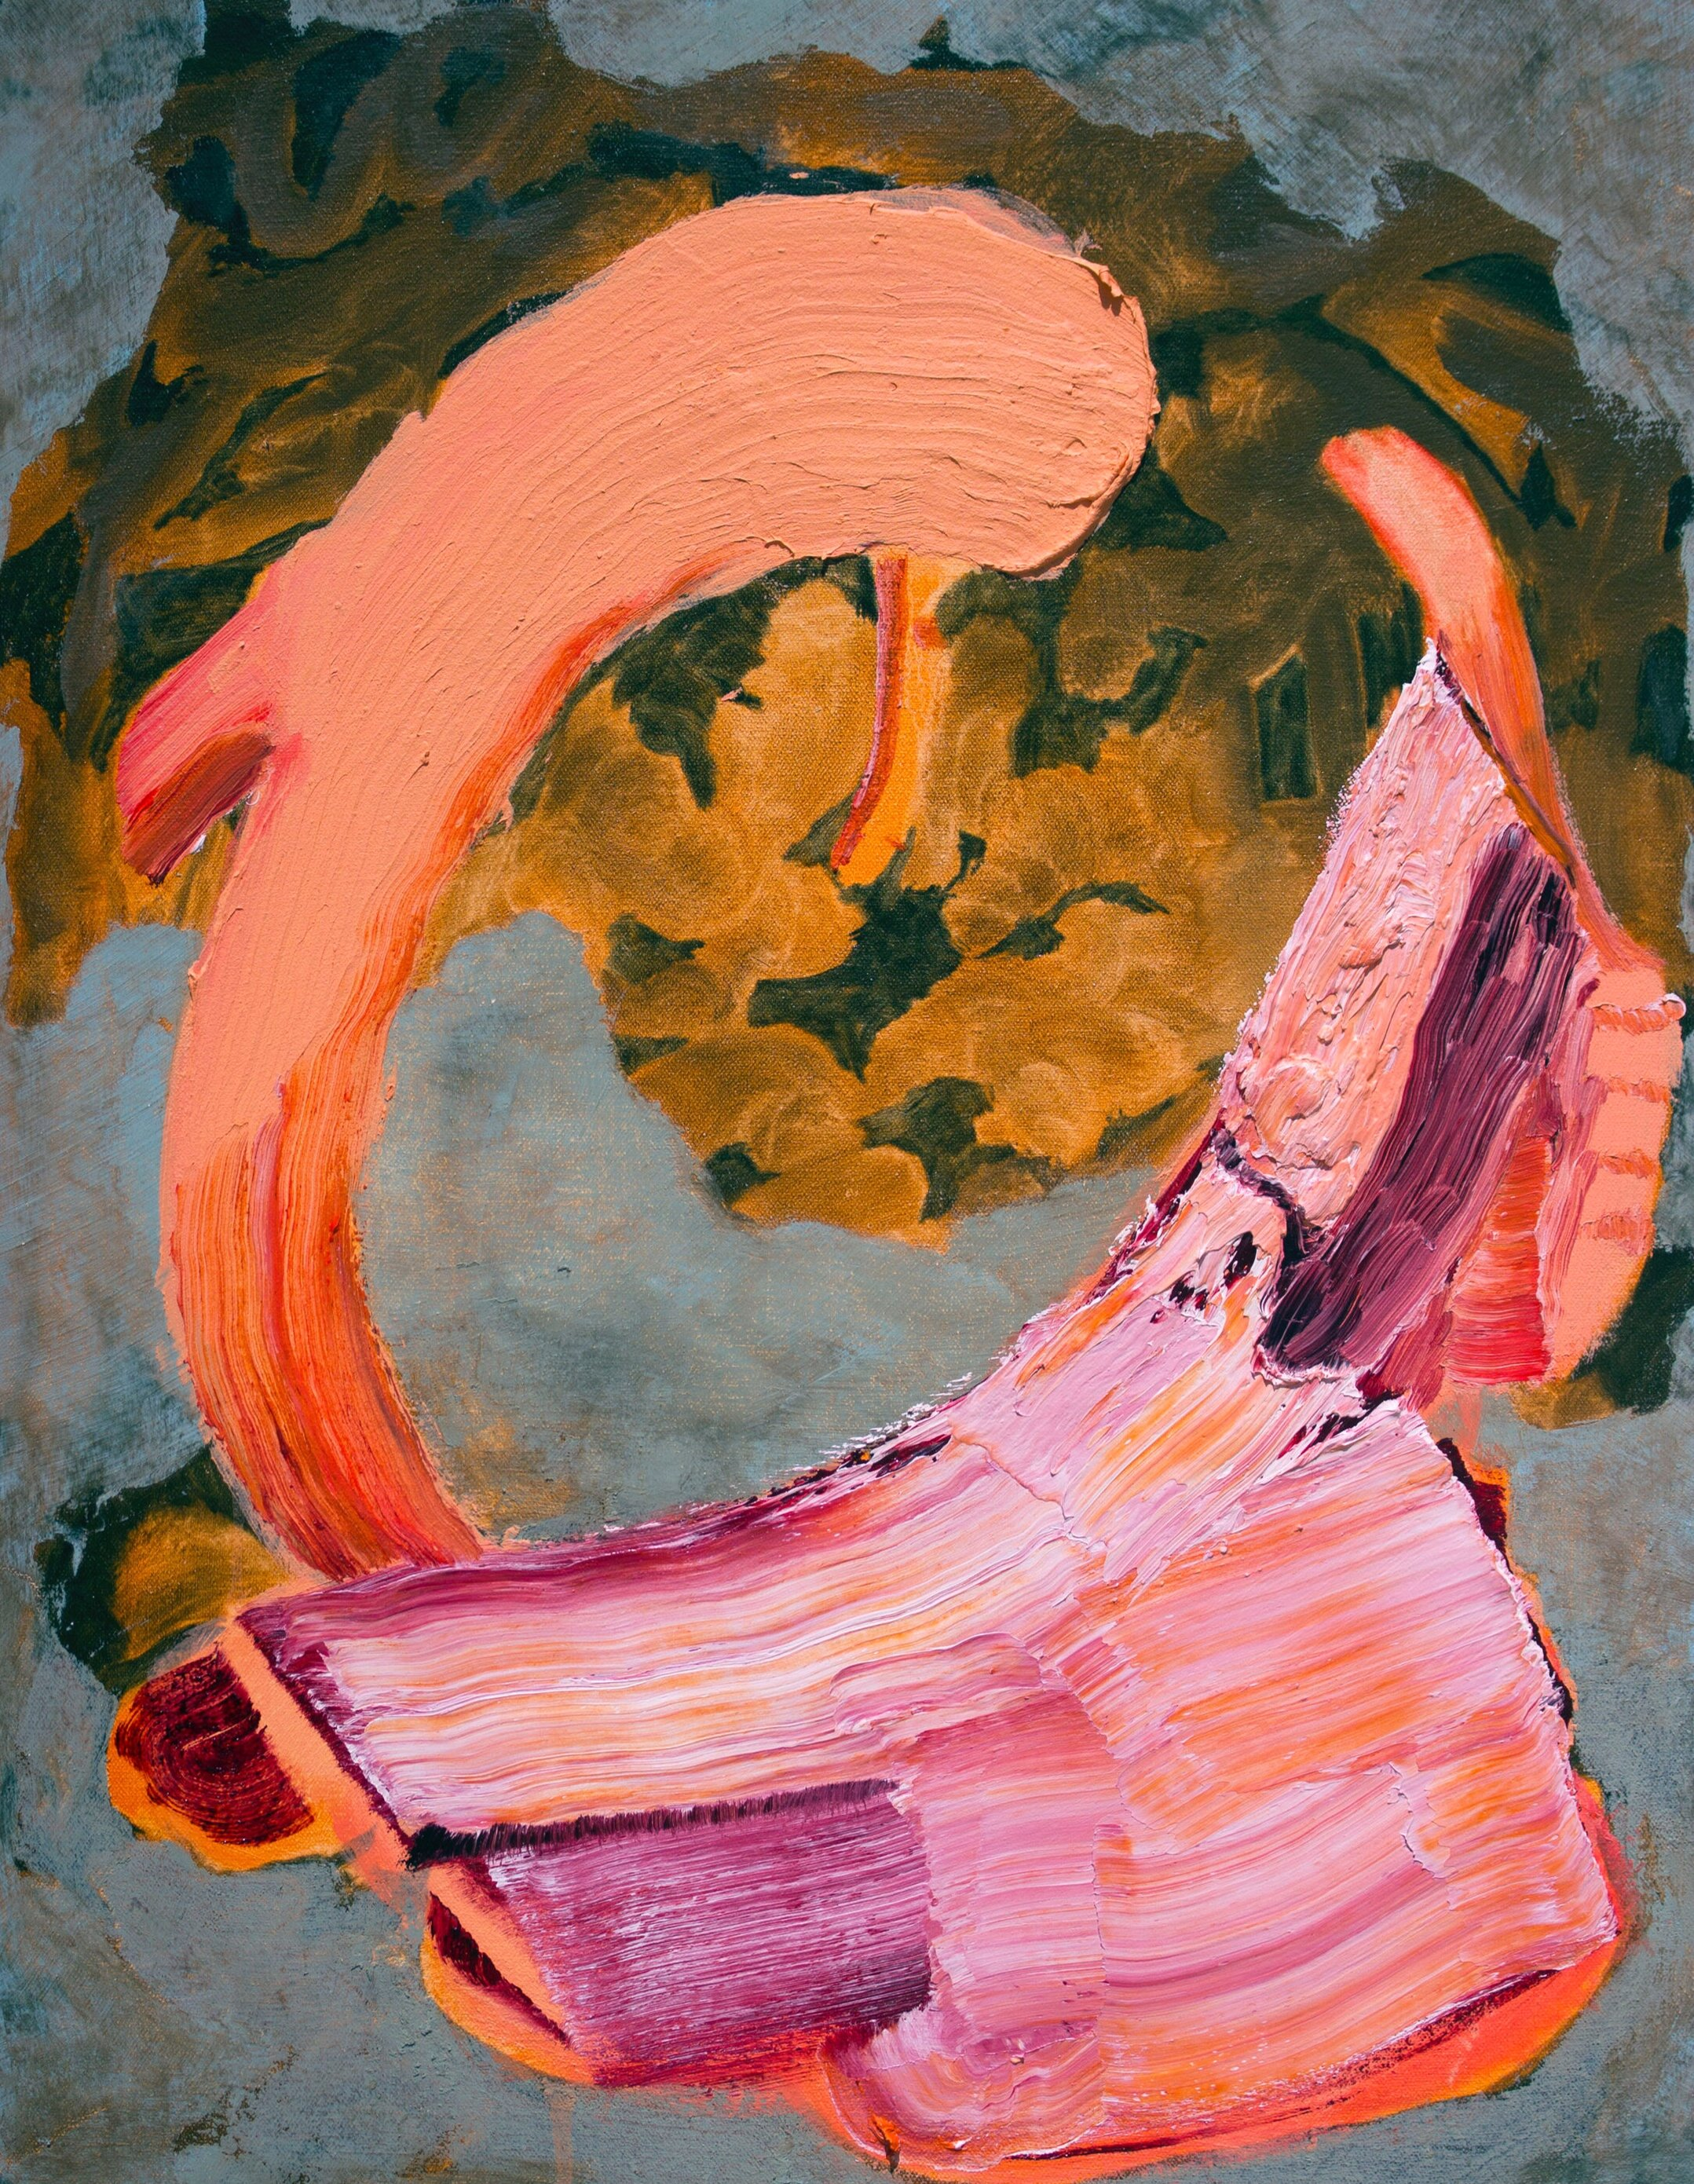 Michael Nauert Idea as Angel, 2019 Oil on canvas 18.25 x 24.25